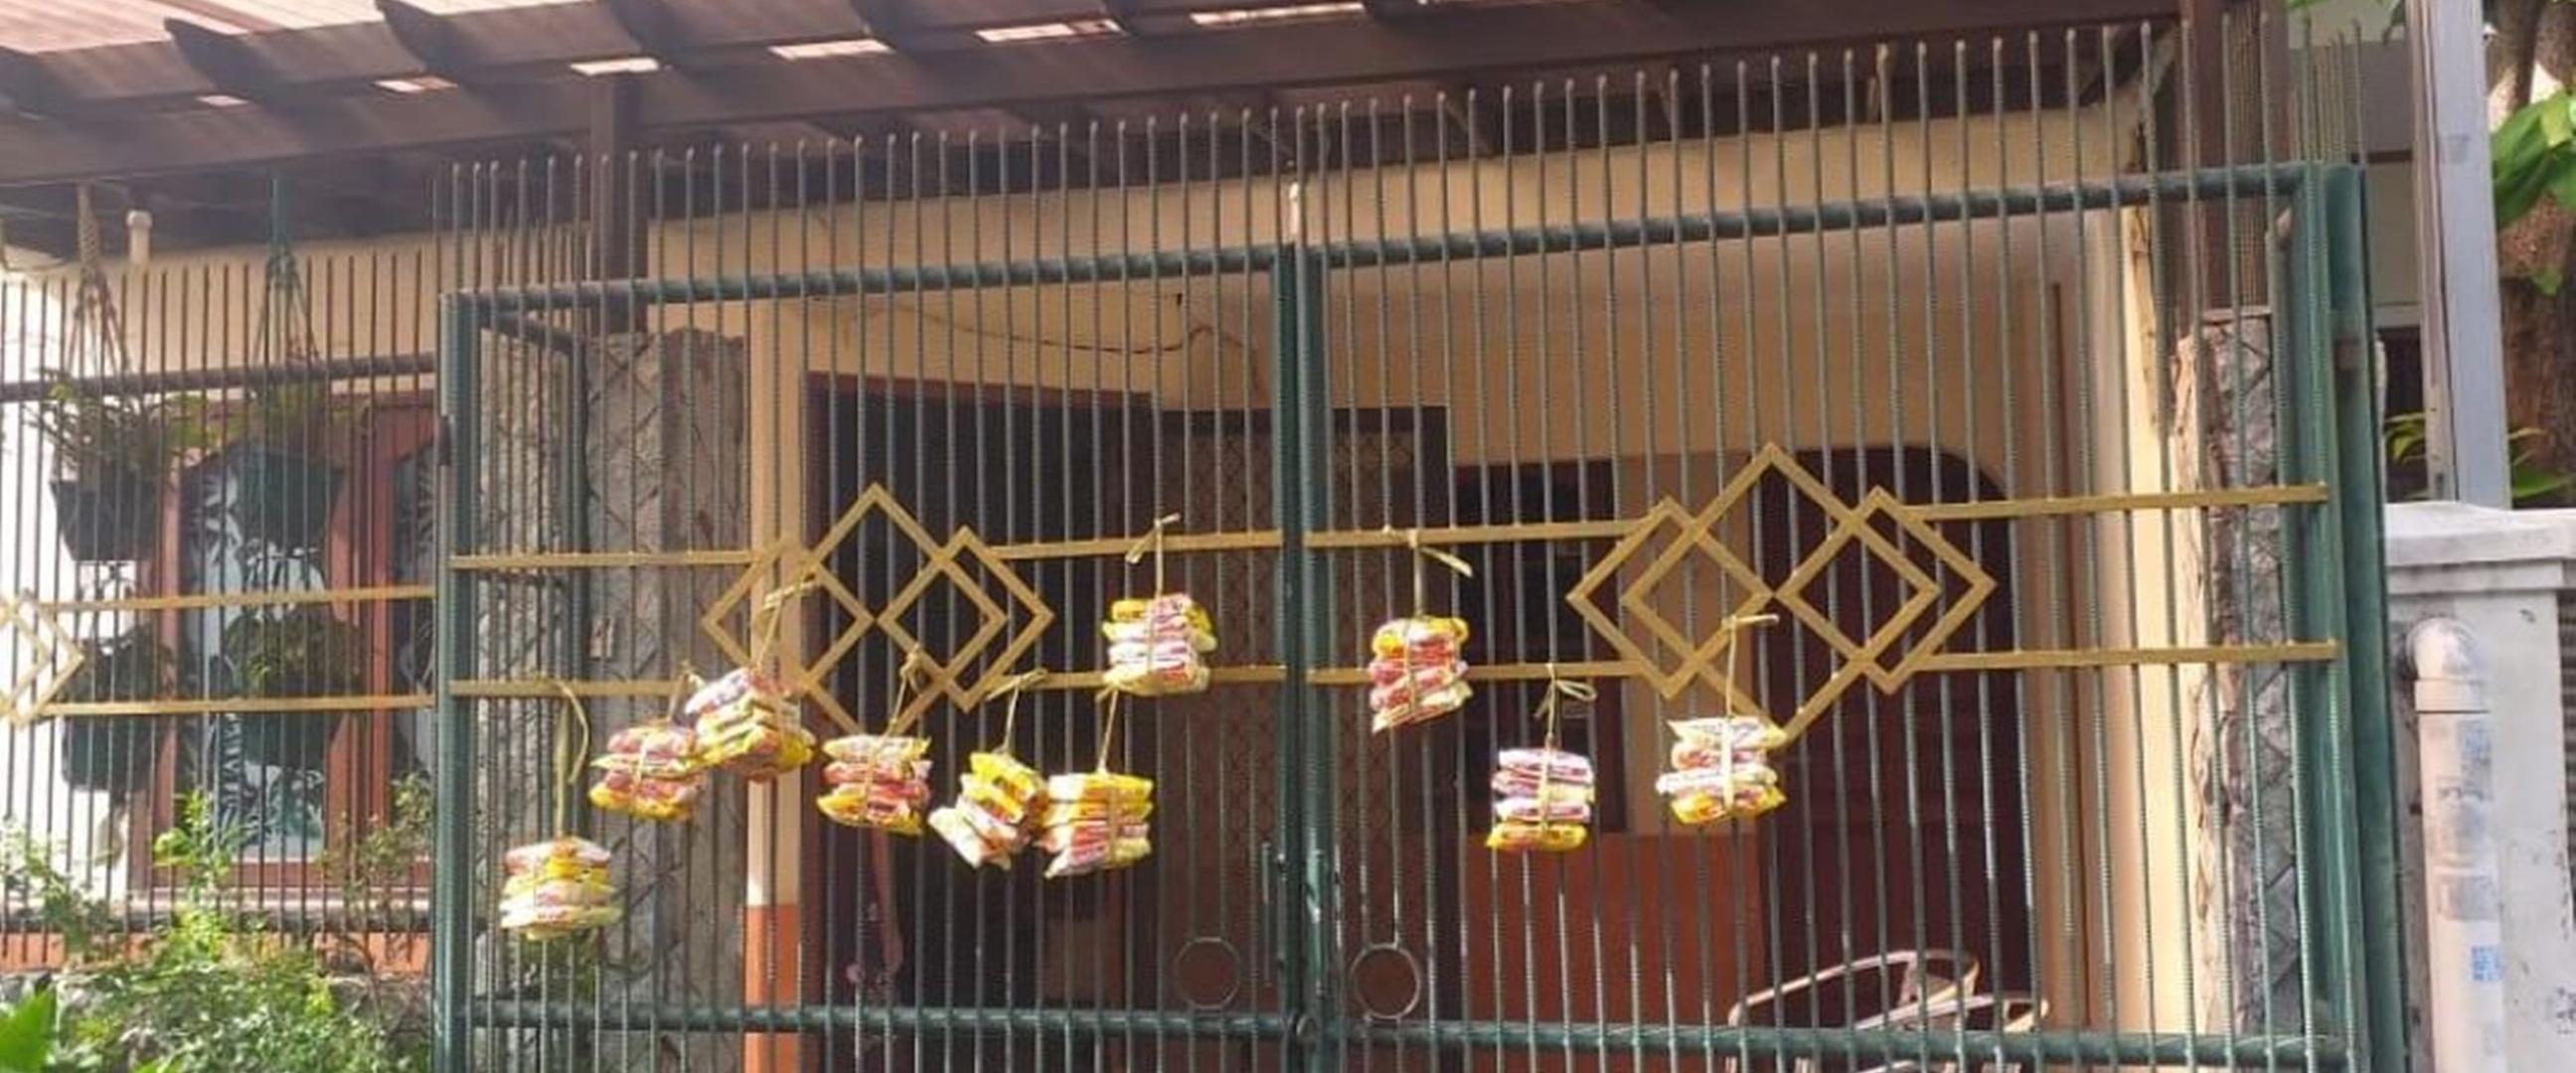 Kisah nenek 84 tahun tiap hari gantung makanan di pagar rumah